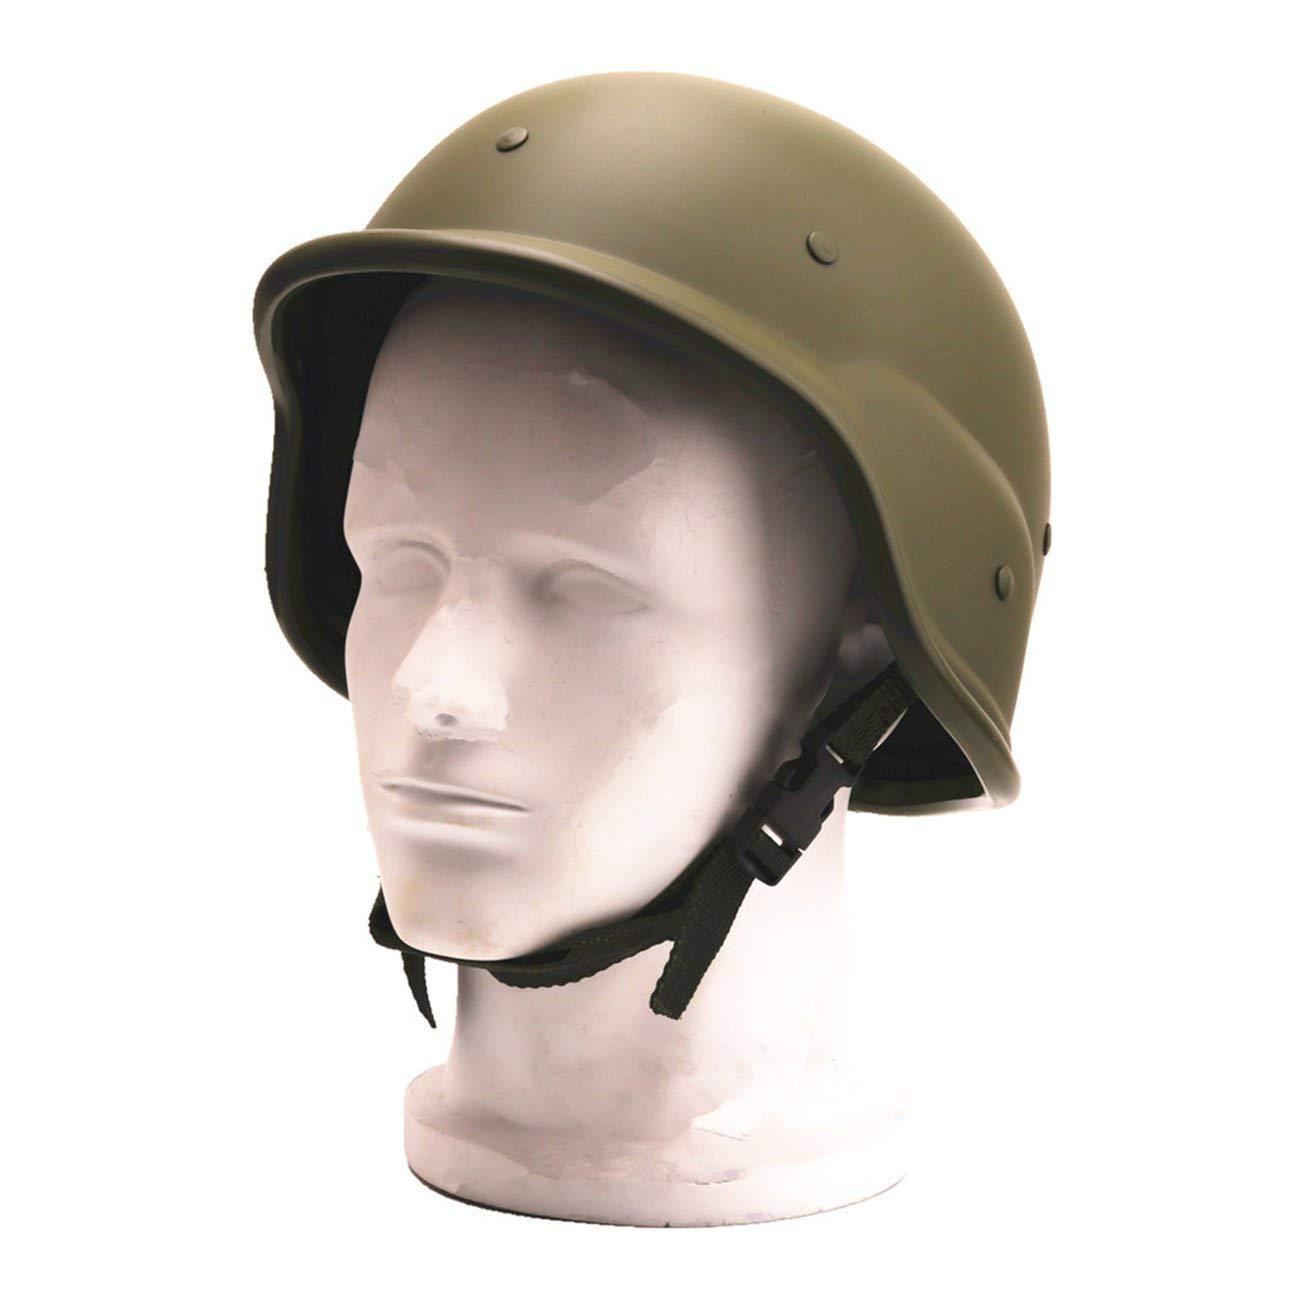 Ballylelly Casco de Camuflaje de pl/ástico ABS M88 T/ácticas al Aire Libre CS Tactical Militar Army Combat Motos Cascos de Moto